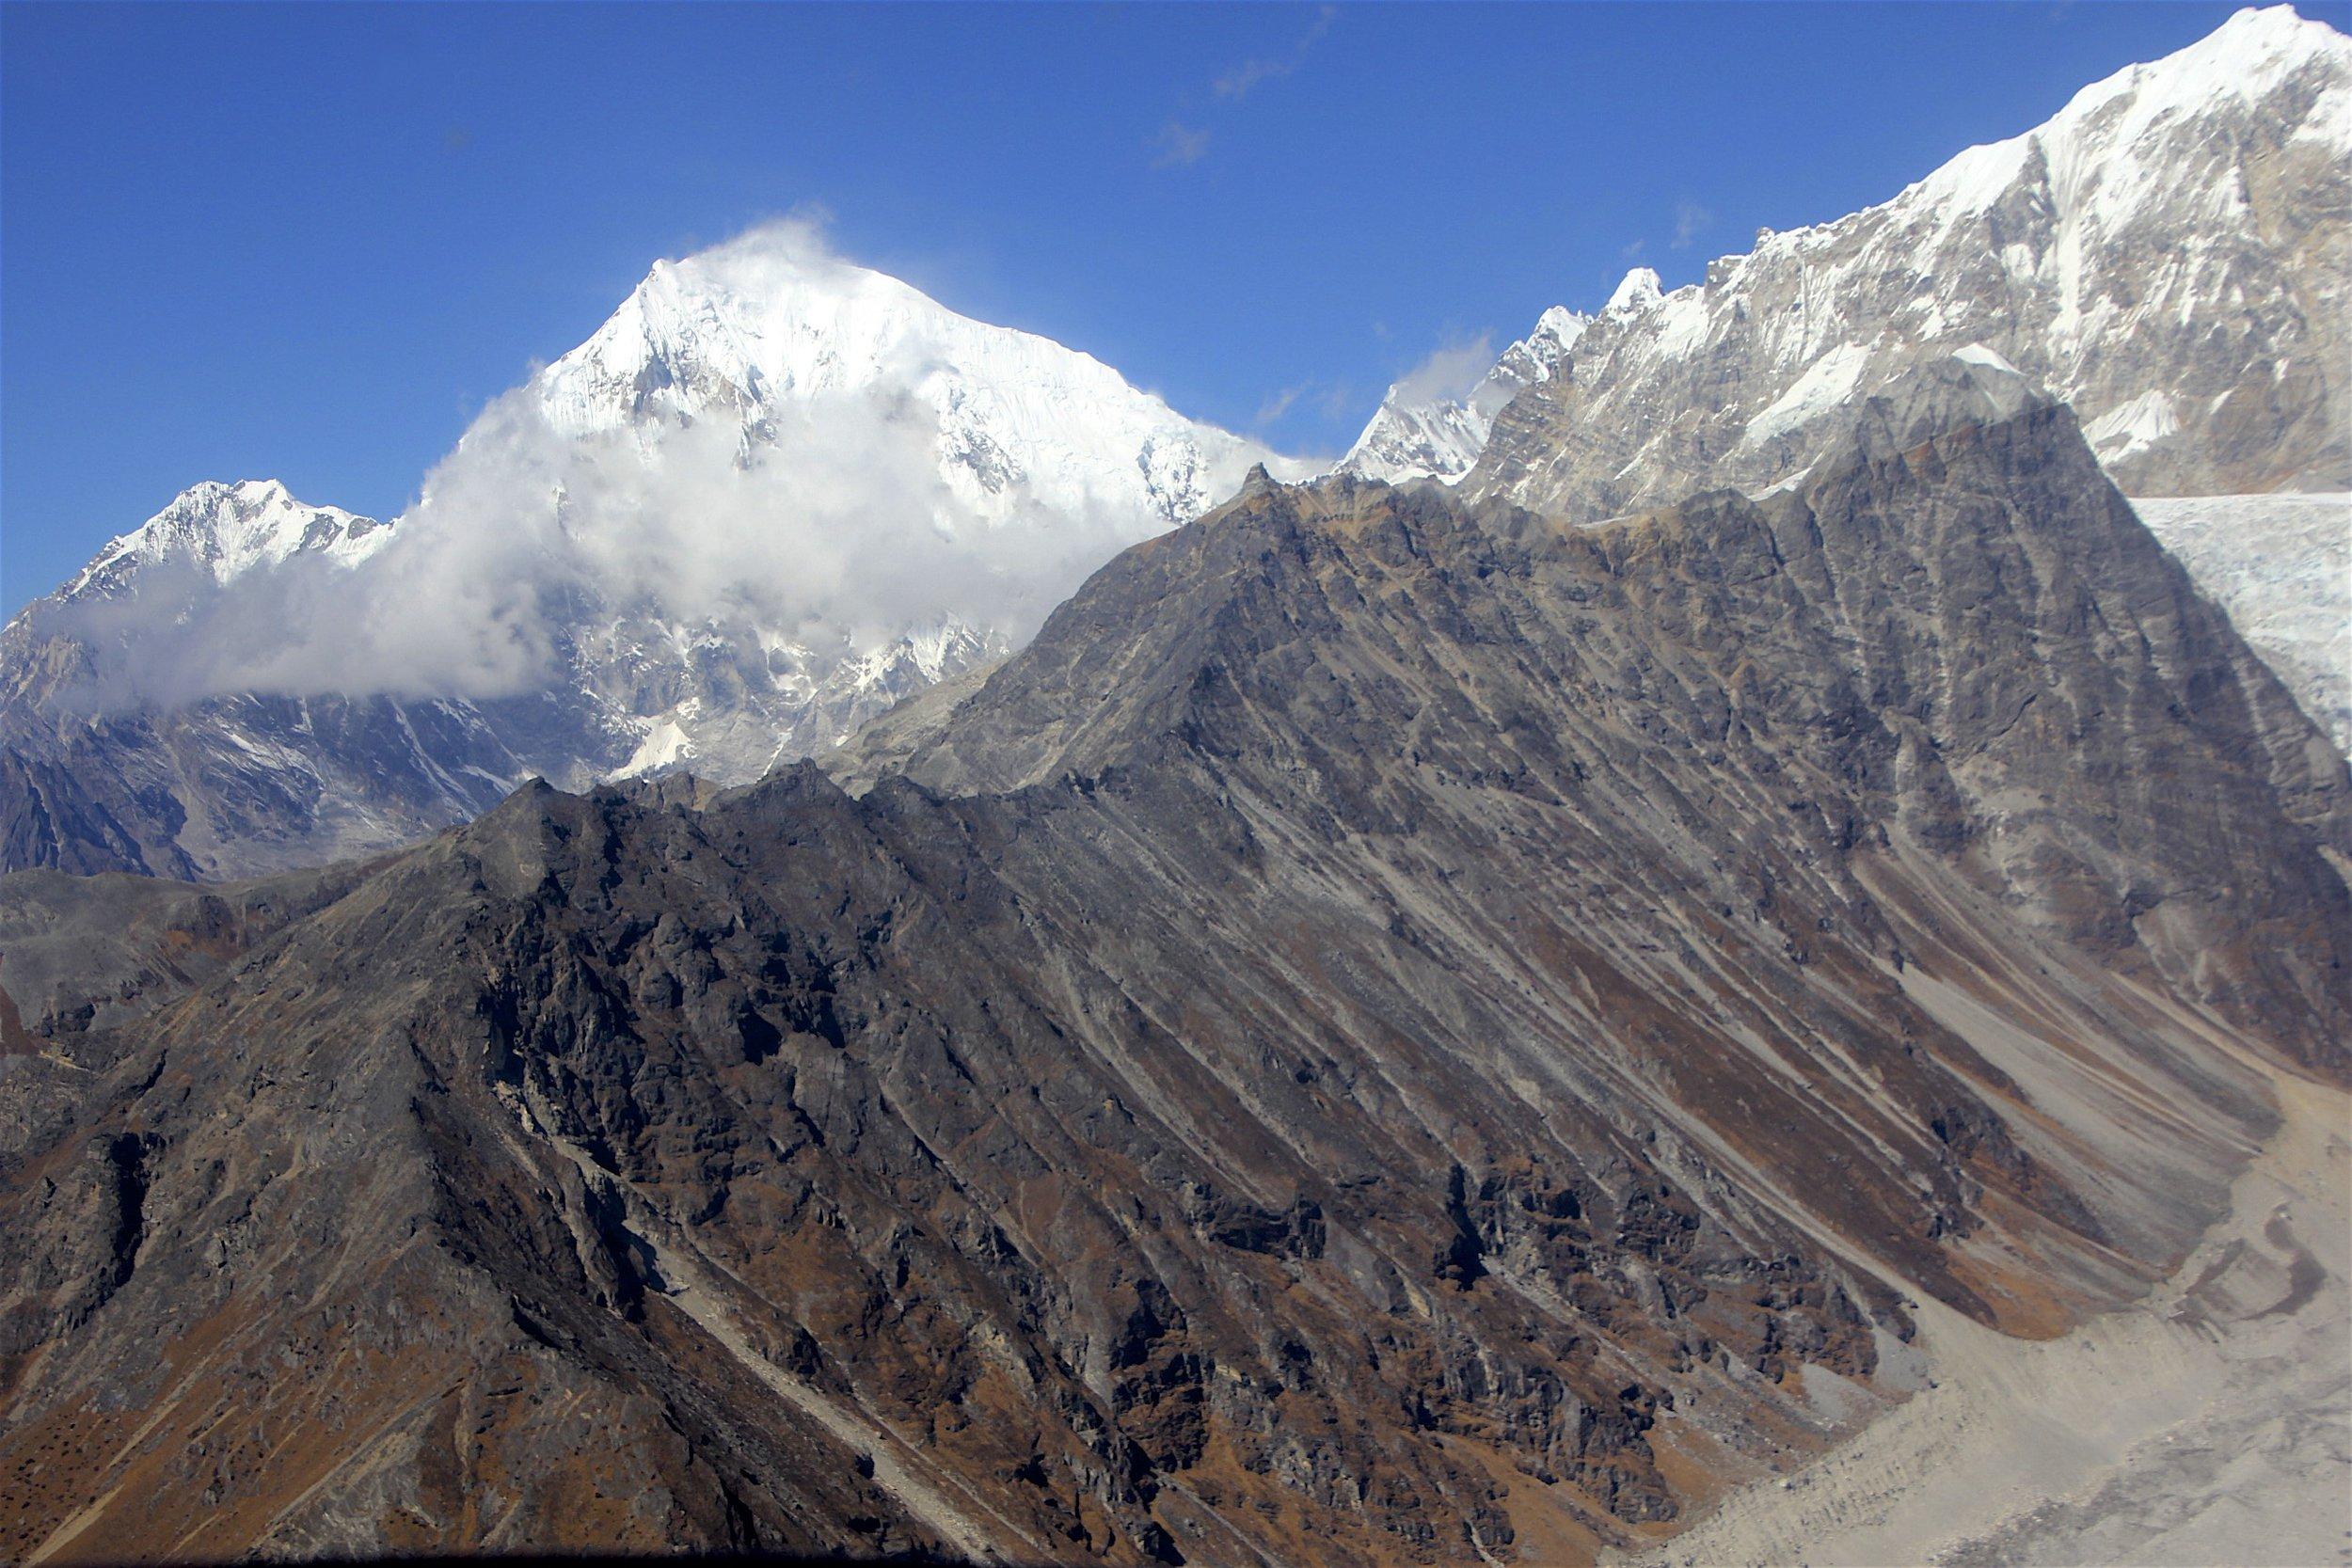 Yala Peak (the point on the ricky ridge) and Langtang Lirung behind